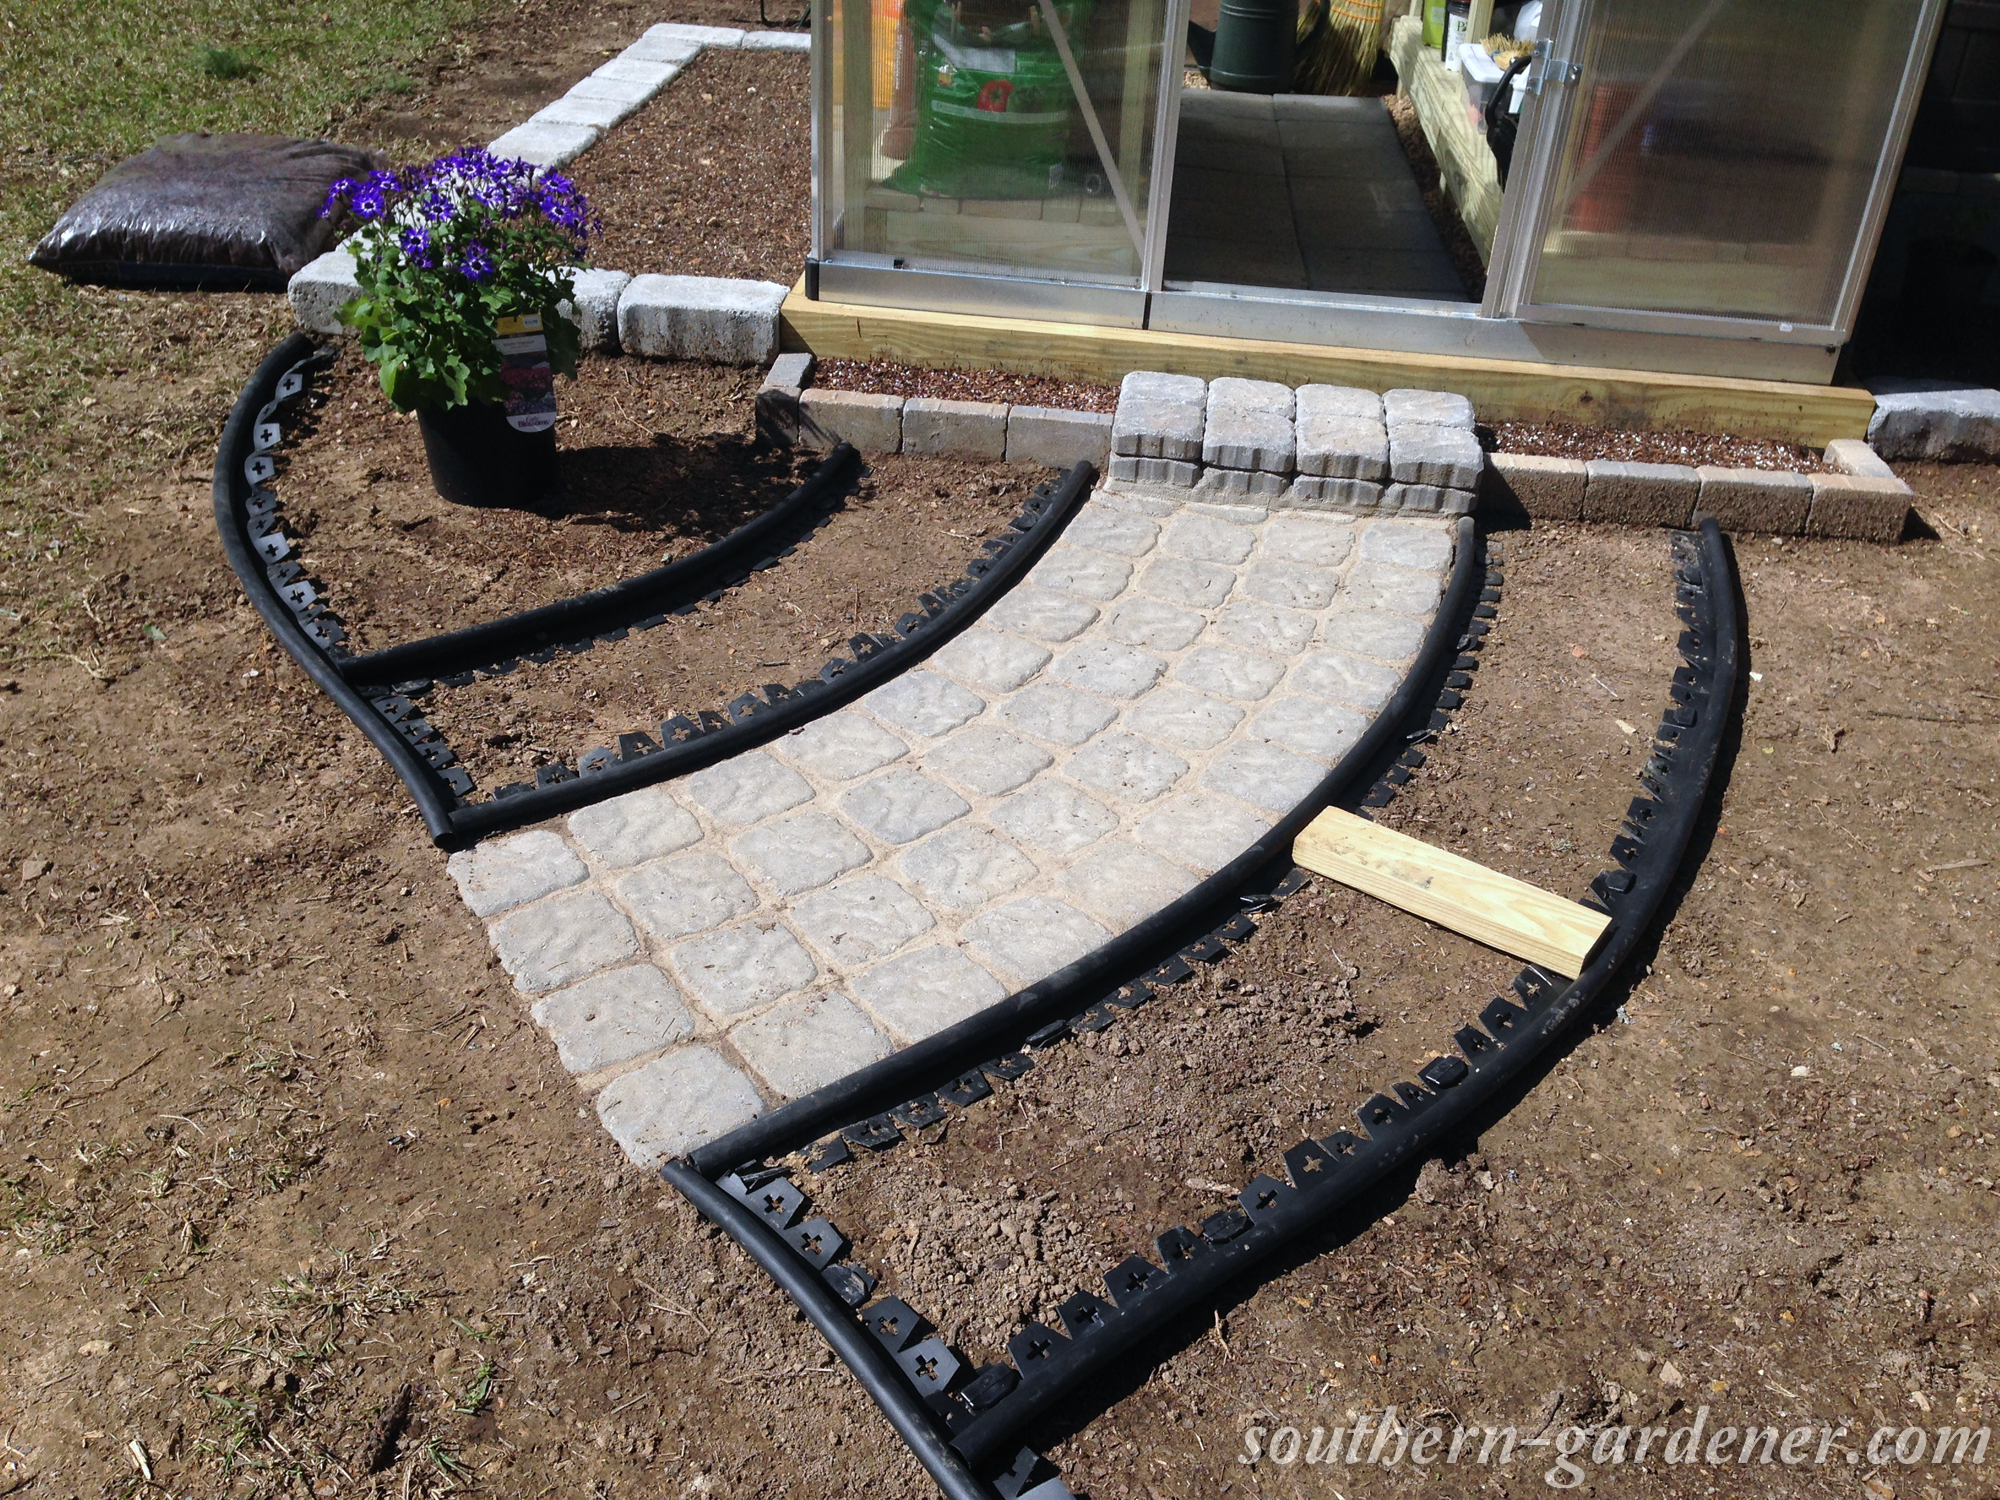 2x4 scrap for measuring flower bed